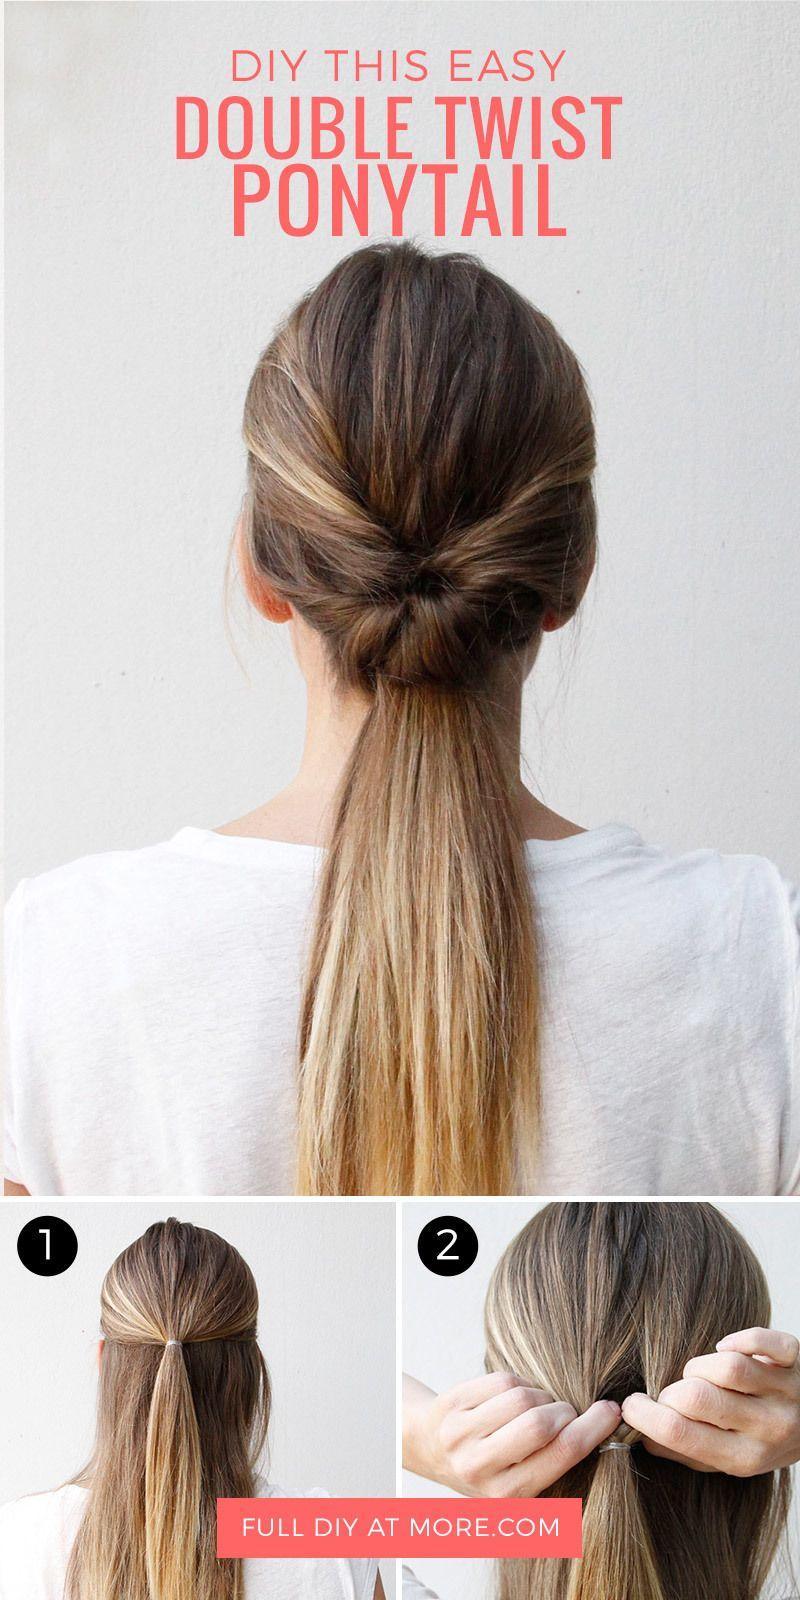 double-twist ponytail